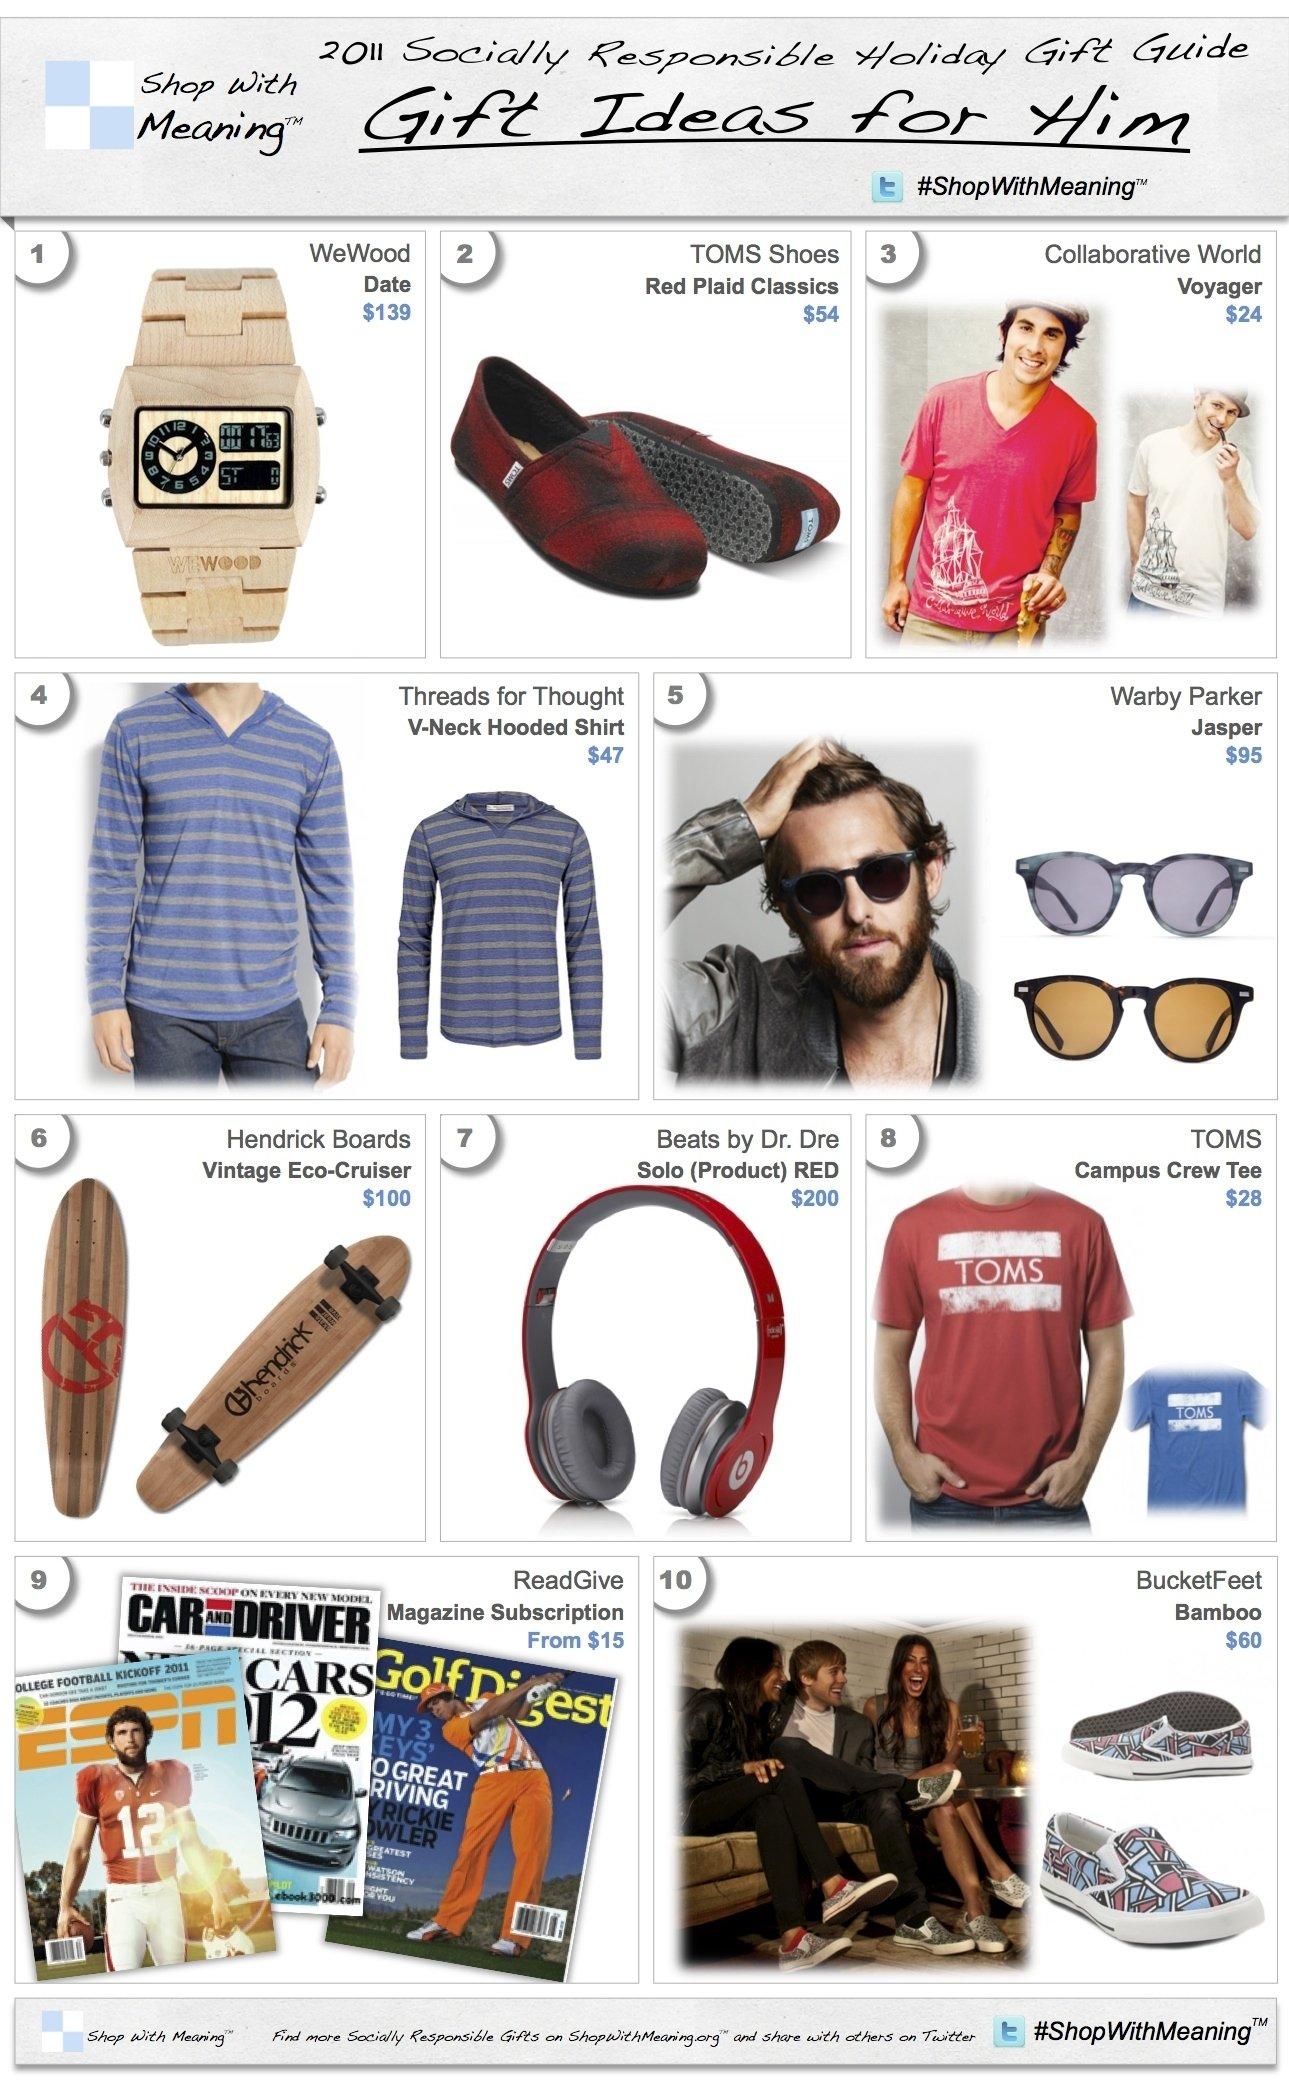 10 Elegant Christmas Gift Ideas For Men 2013 glamorous xmas presents for men 39 popular gifts most mens christmas